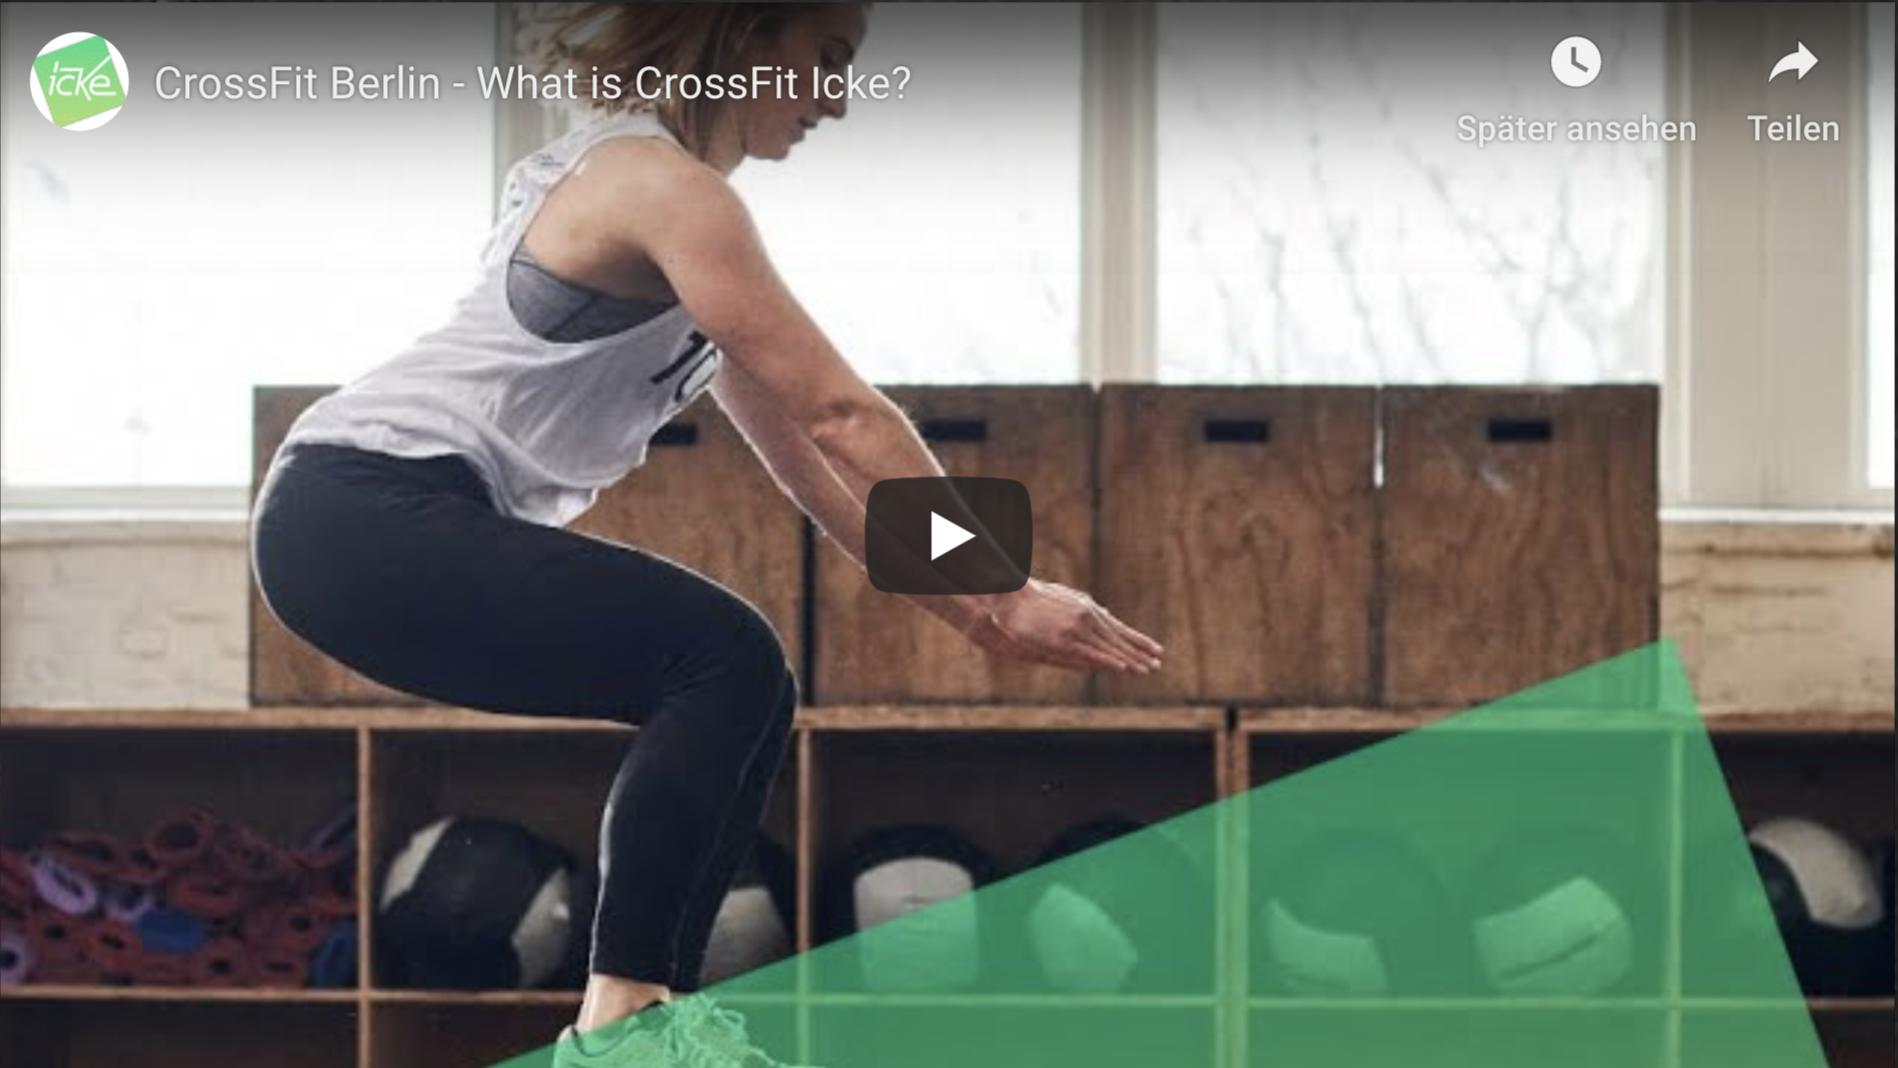 CrossFit Berlin Video Icke